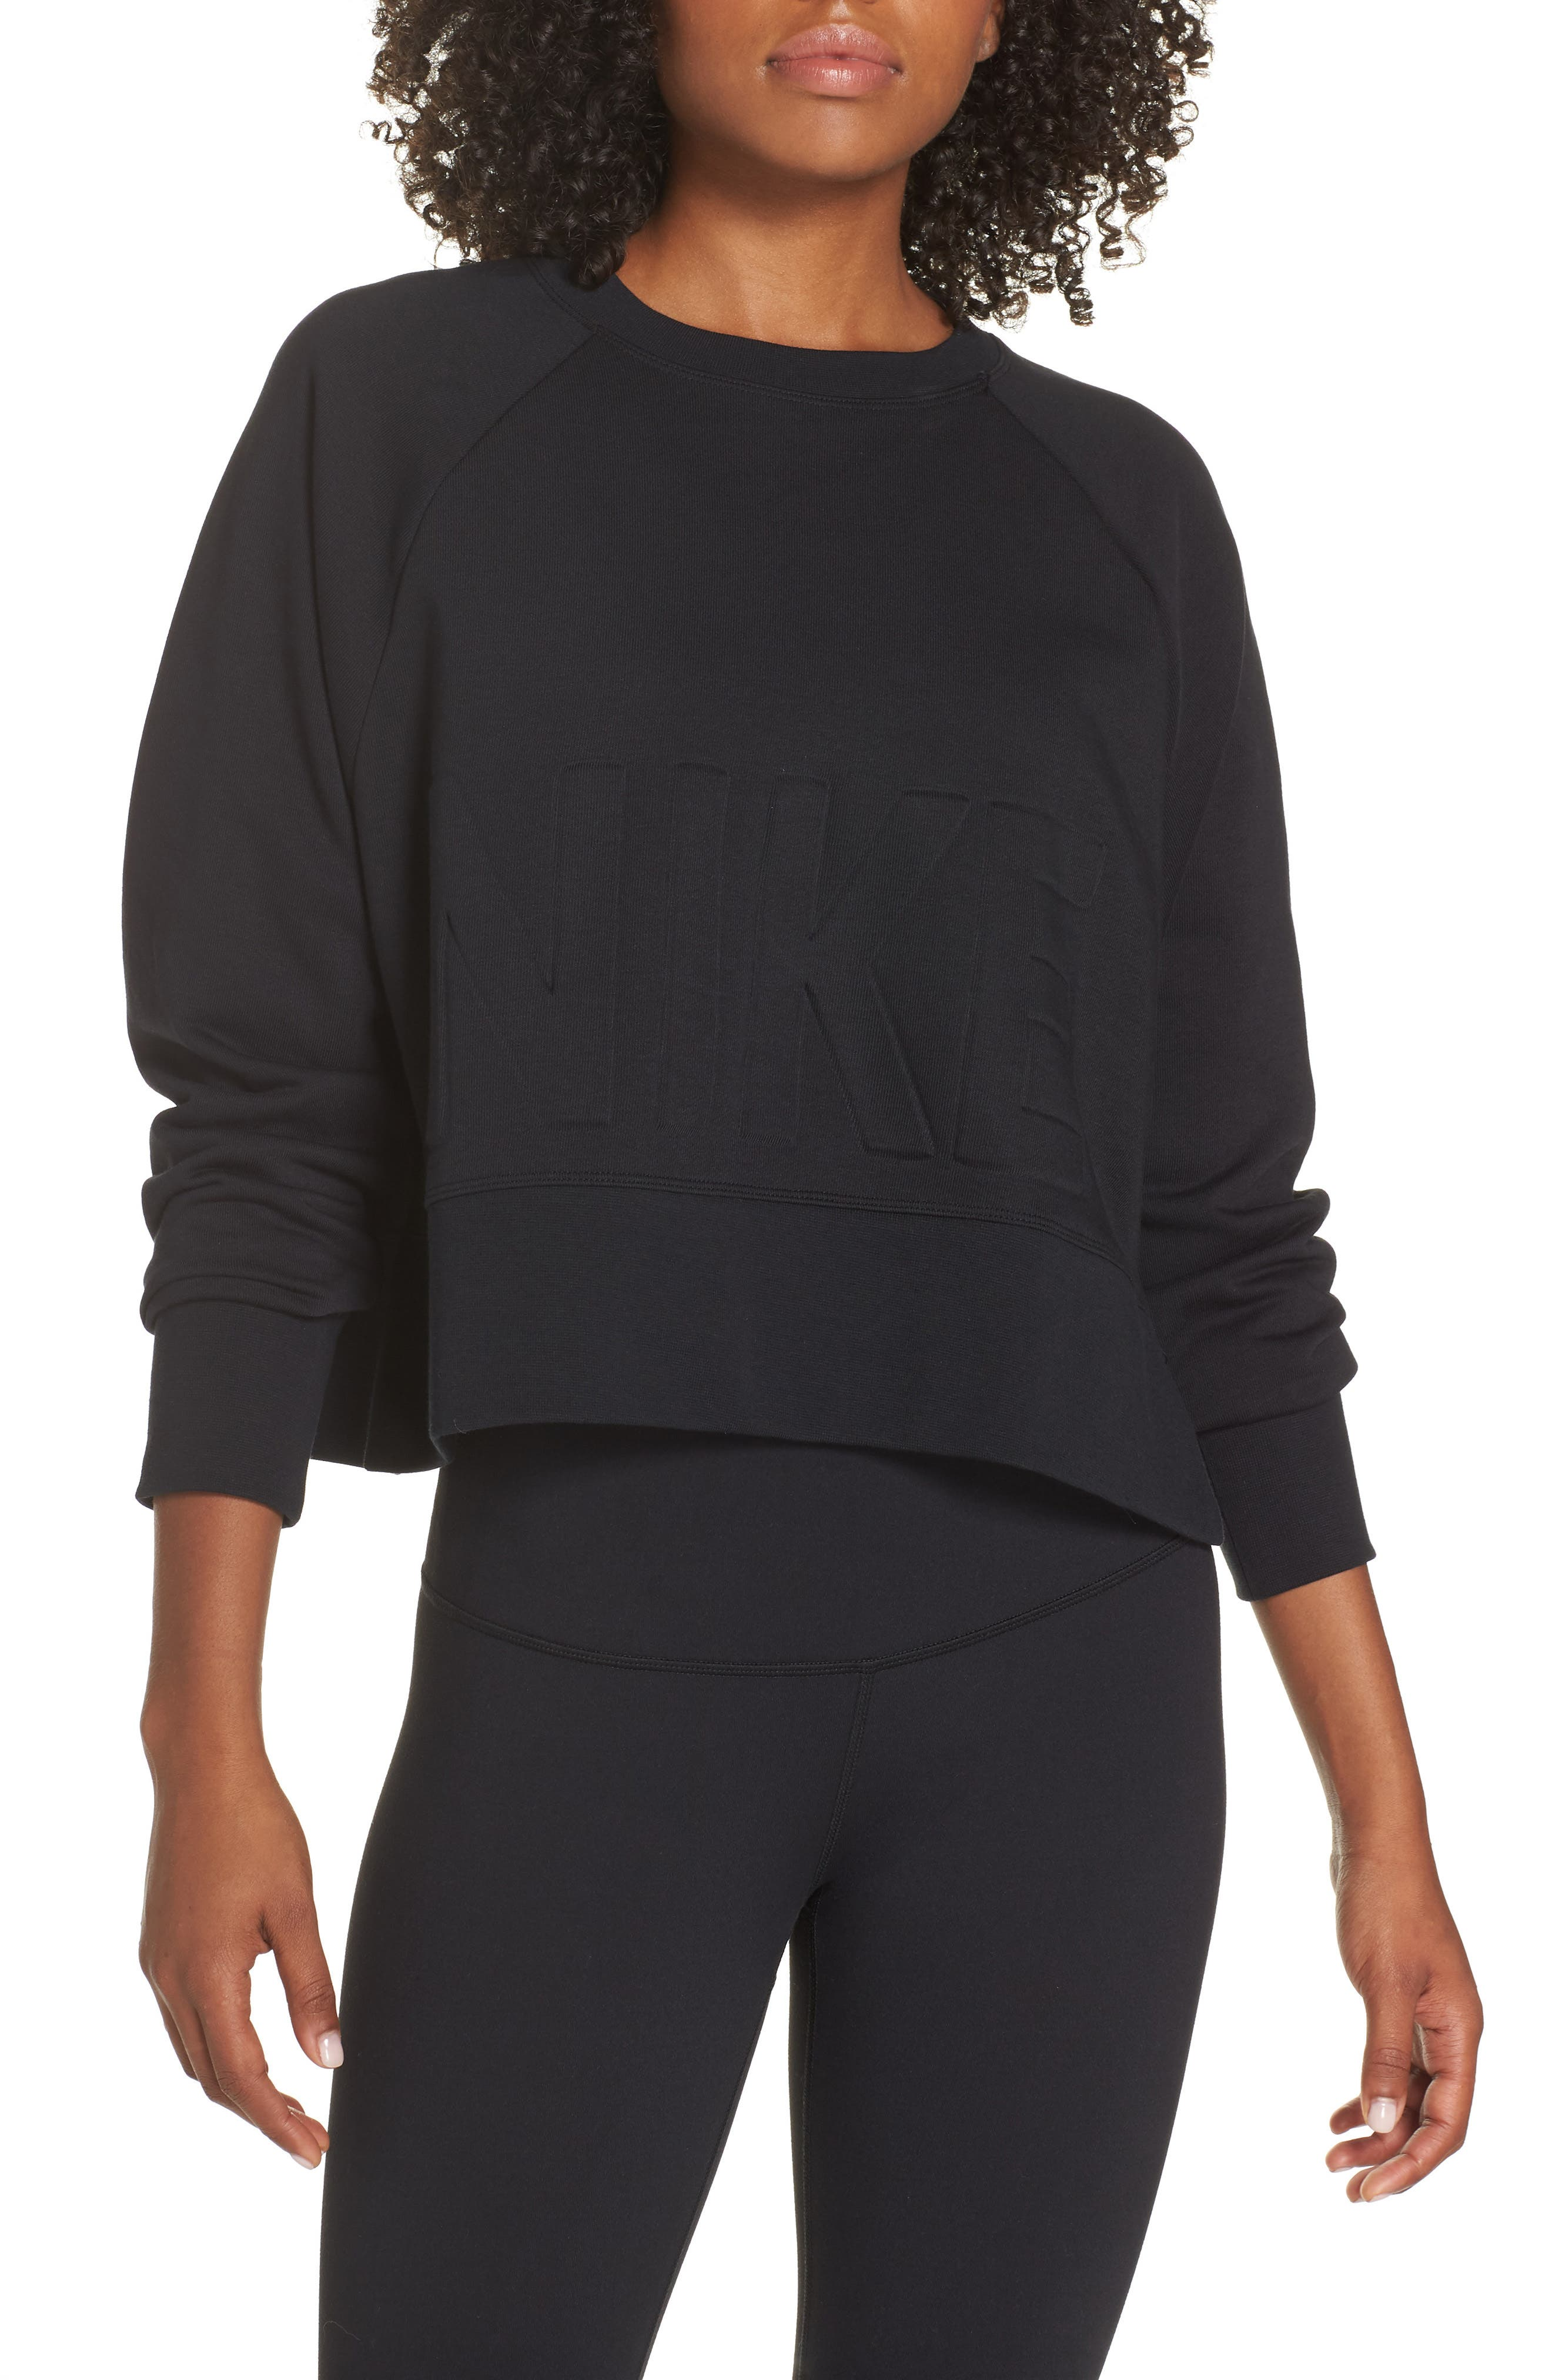 Dry Versa Training Top,                         Main,                         color, BLACK/ BLACK